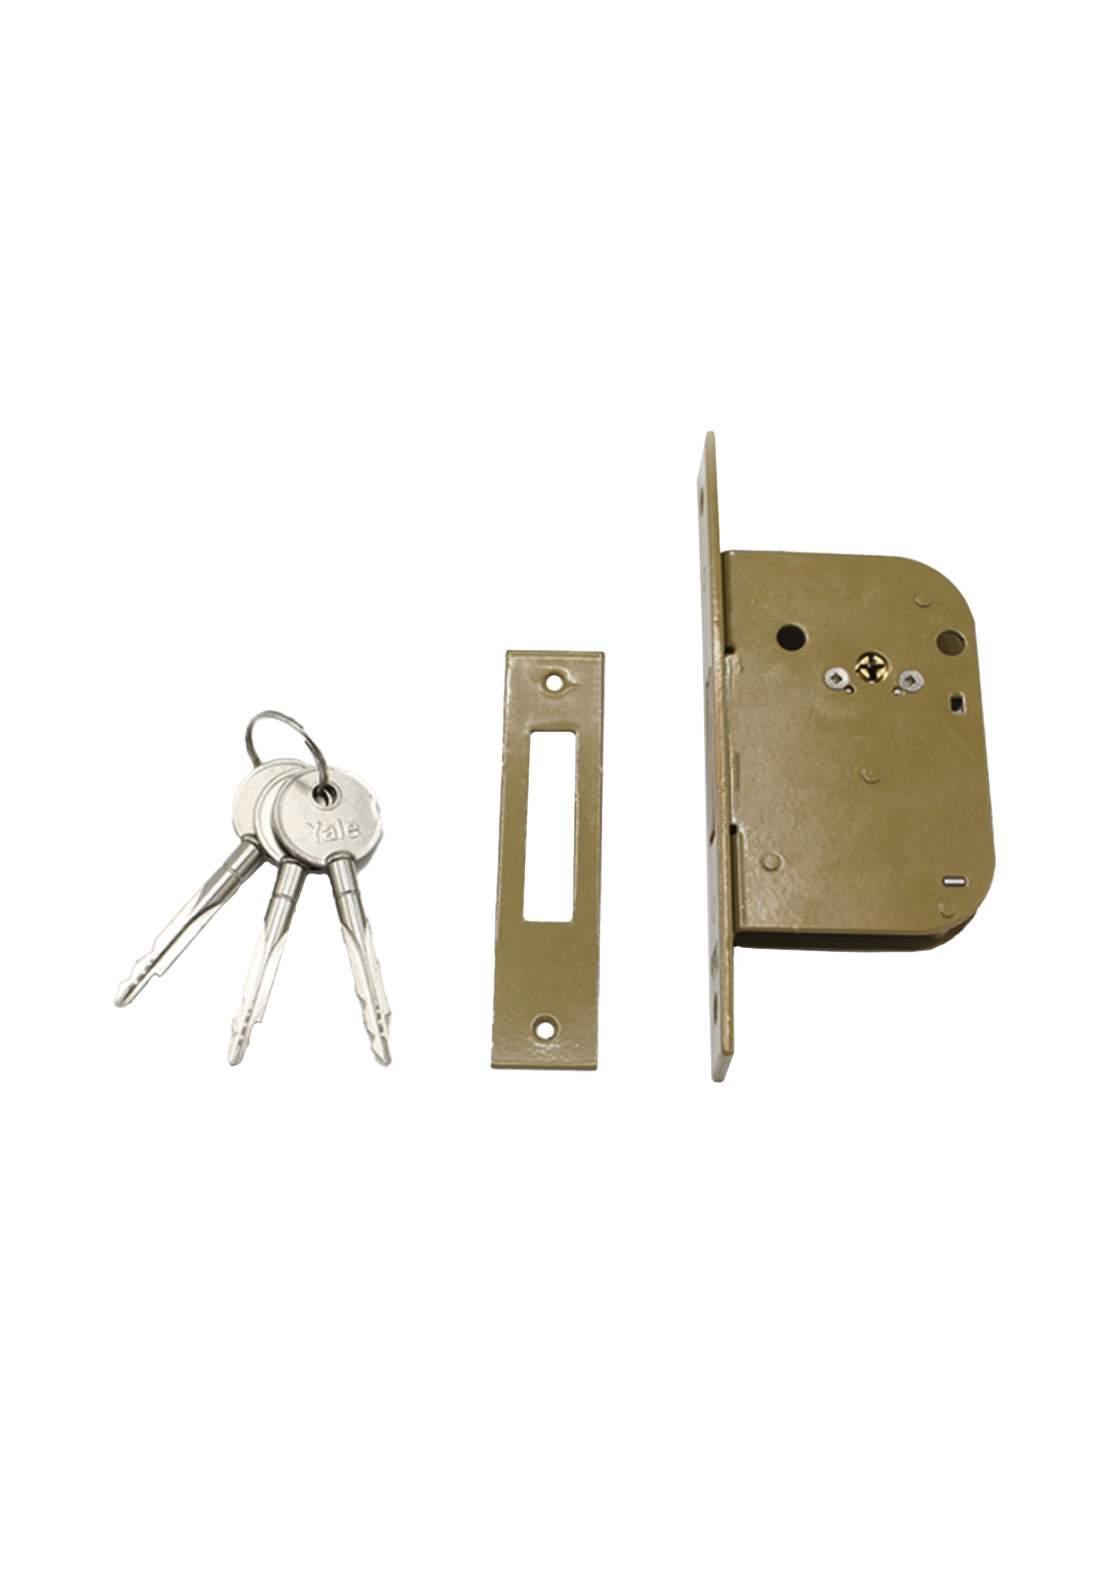 Yale 5630045  Smart Door Lock 45 mm قفل باب بدون جوزة